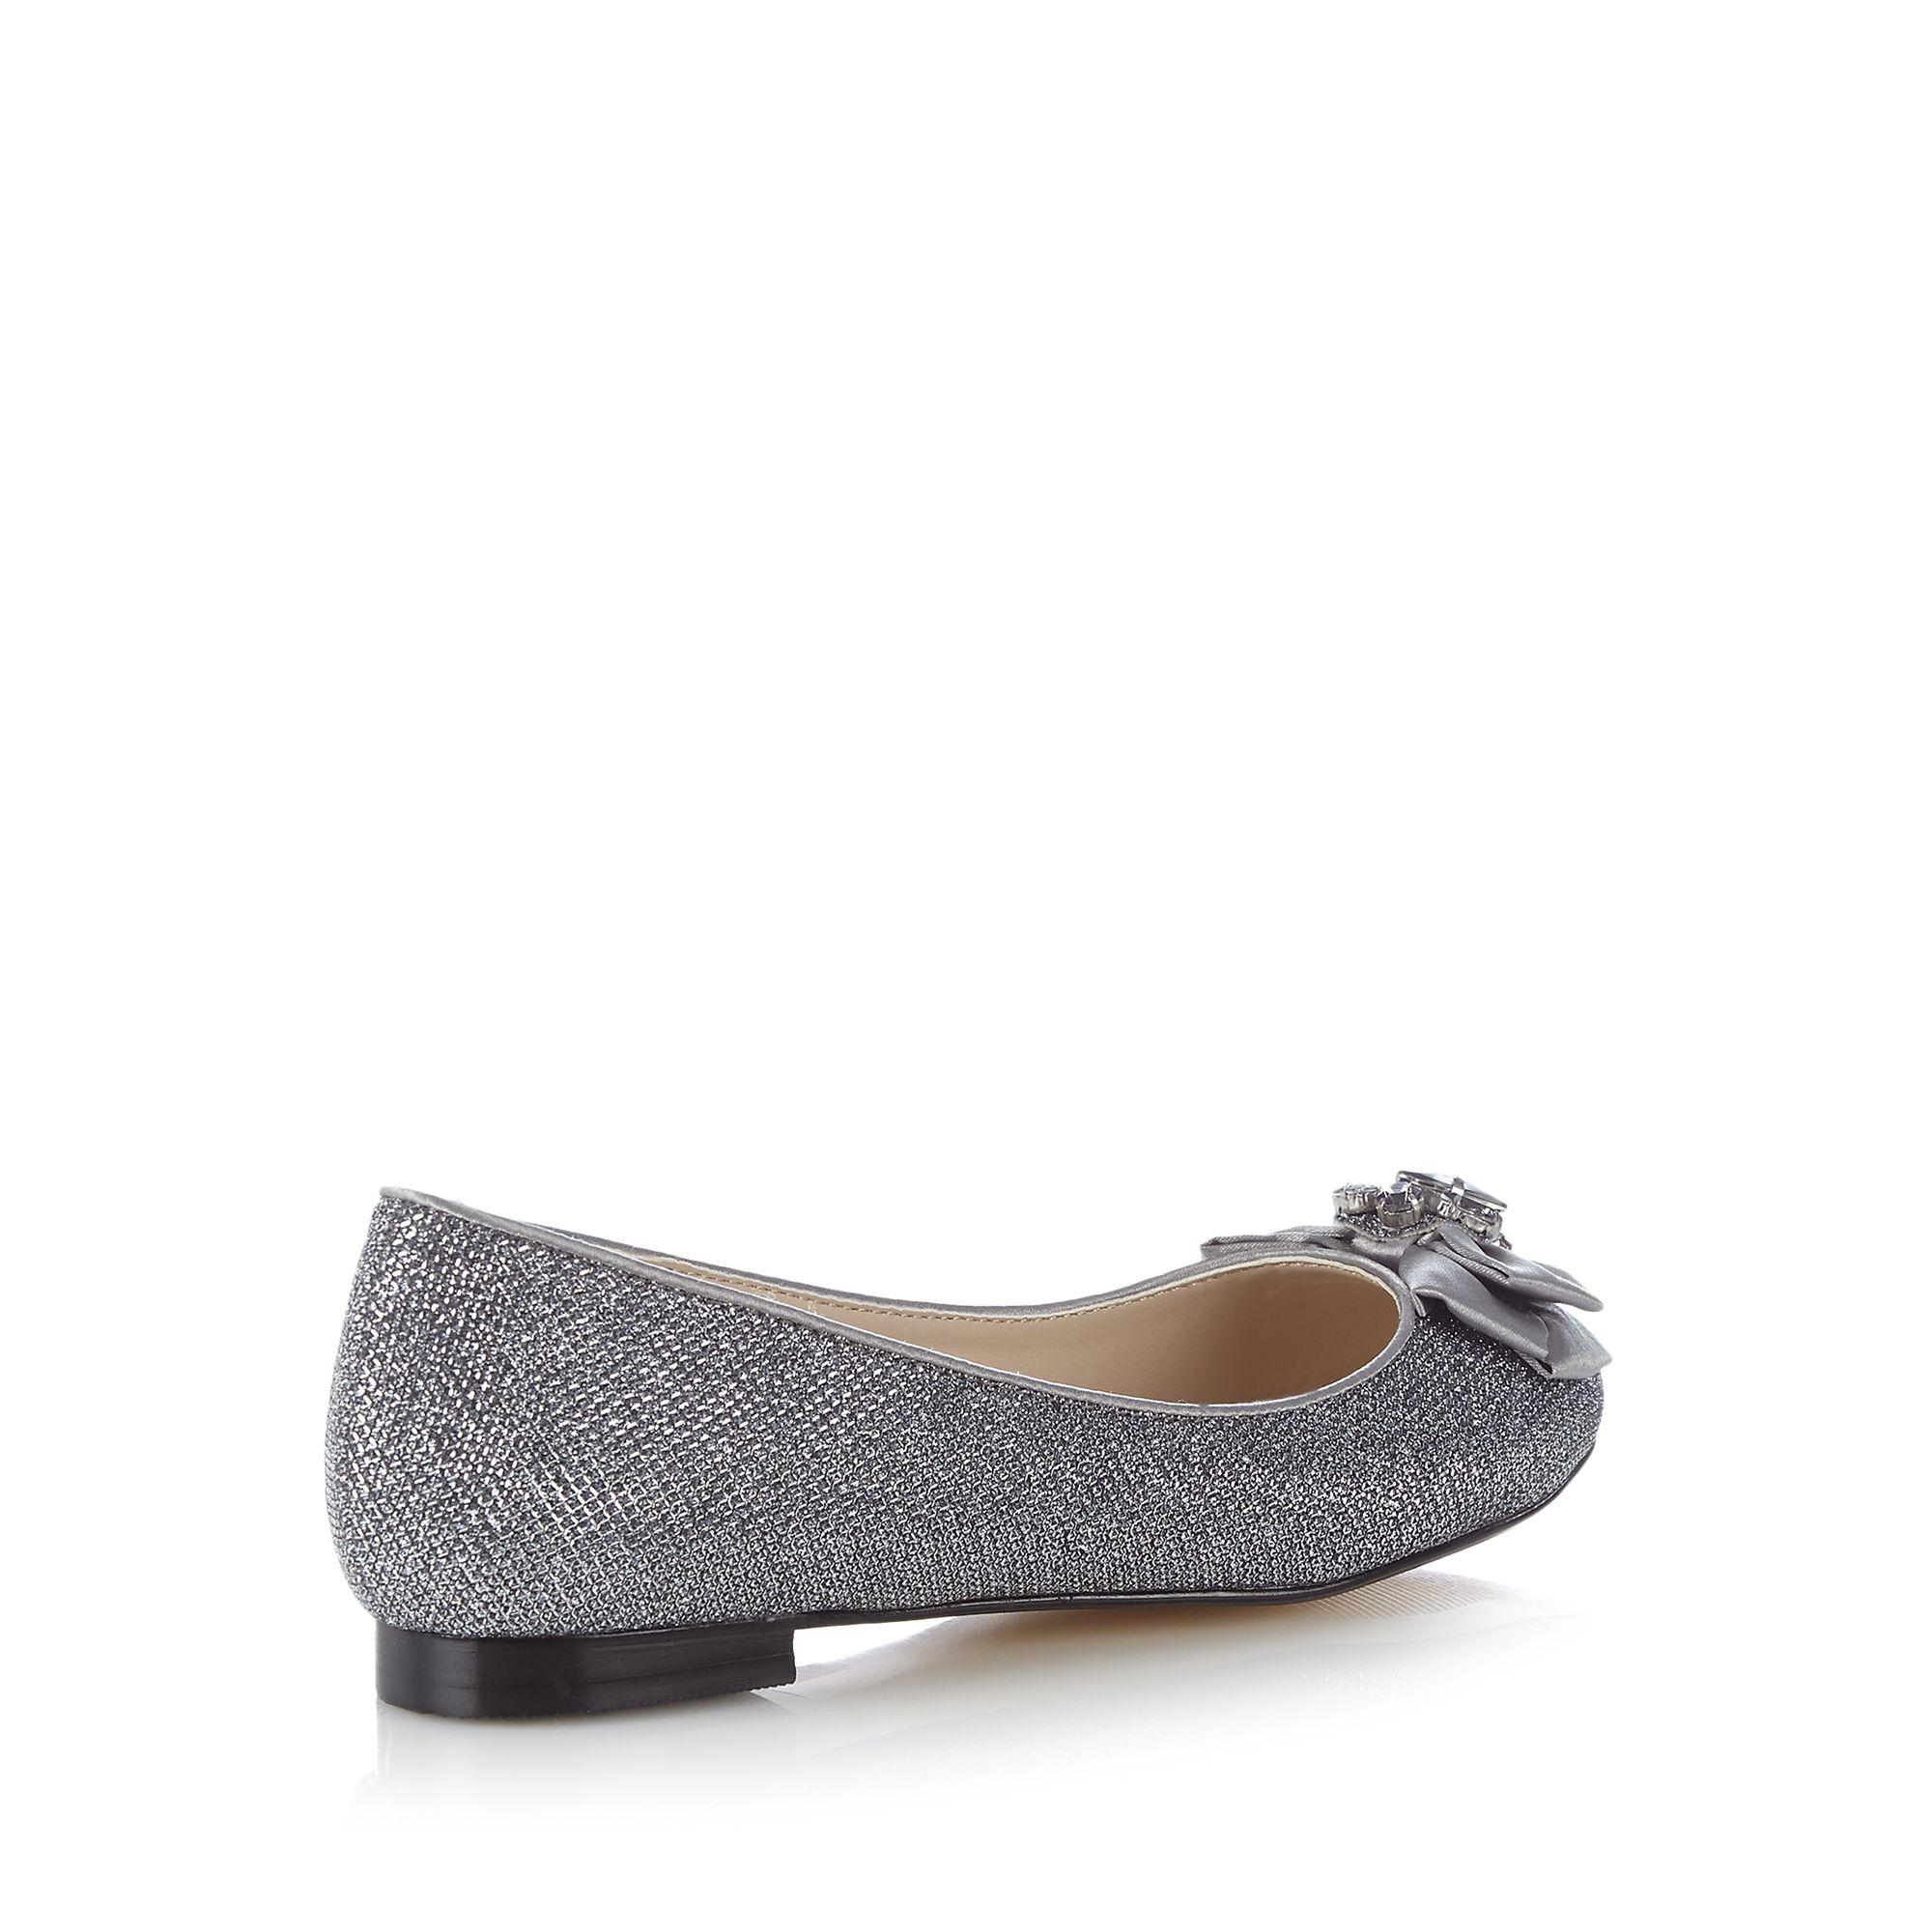 debut womens silver metallic bow shoes from debenhams